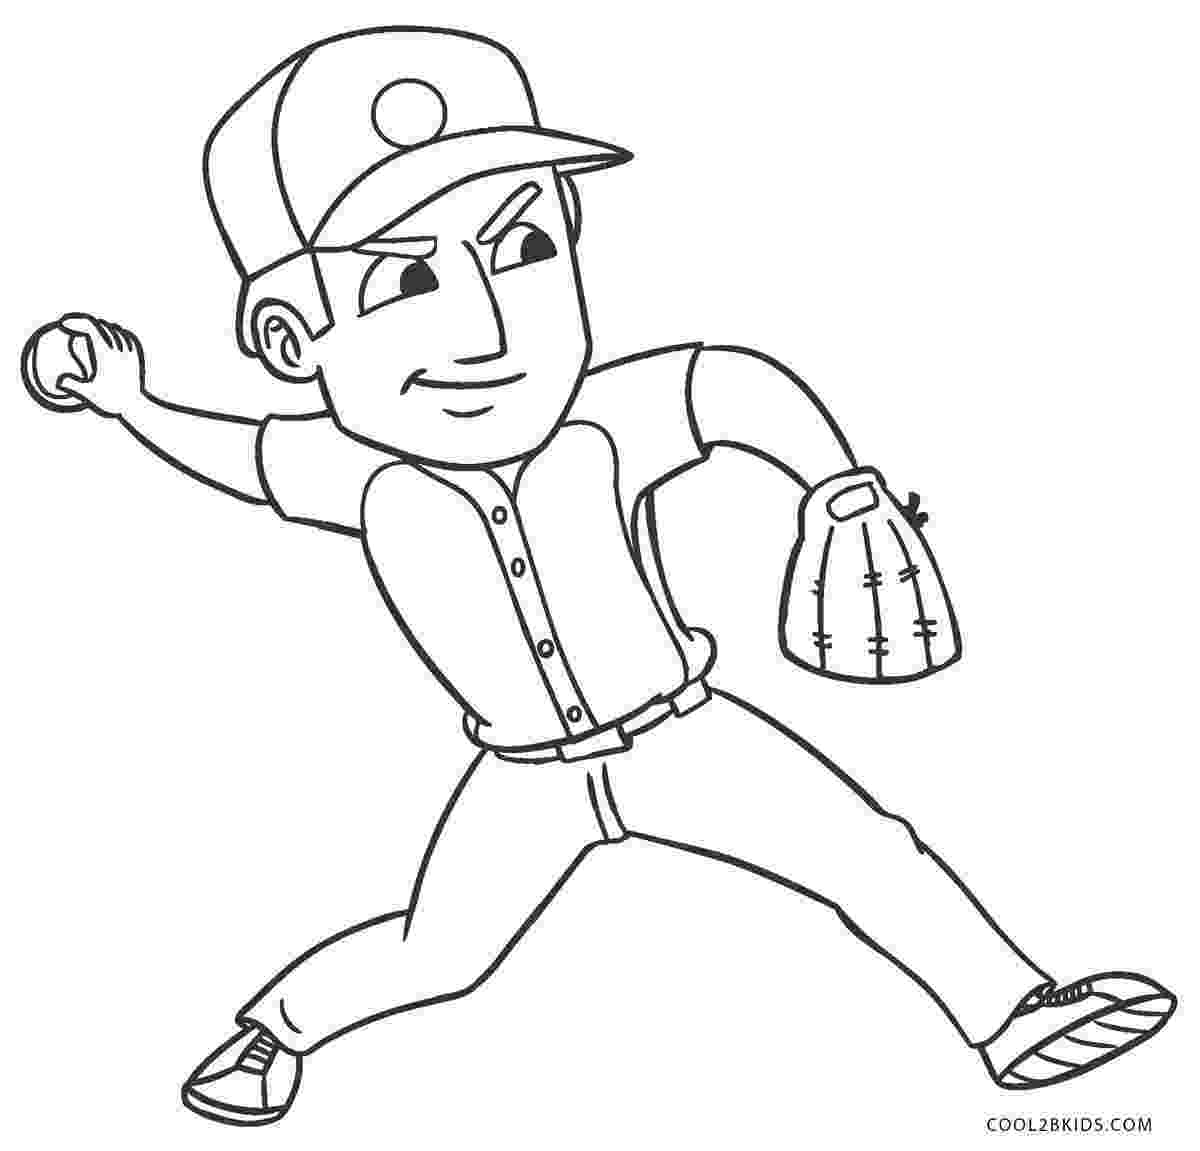 coloring pages baseball free printable baseball coloring pages for kids best pages baseball coloring